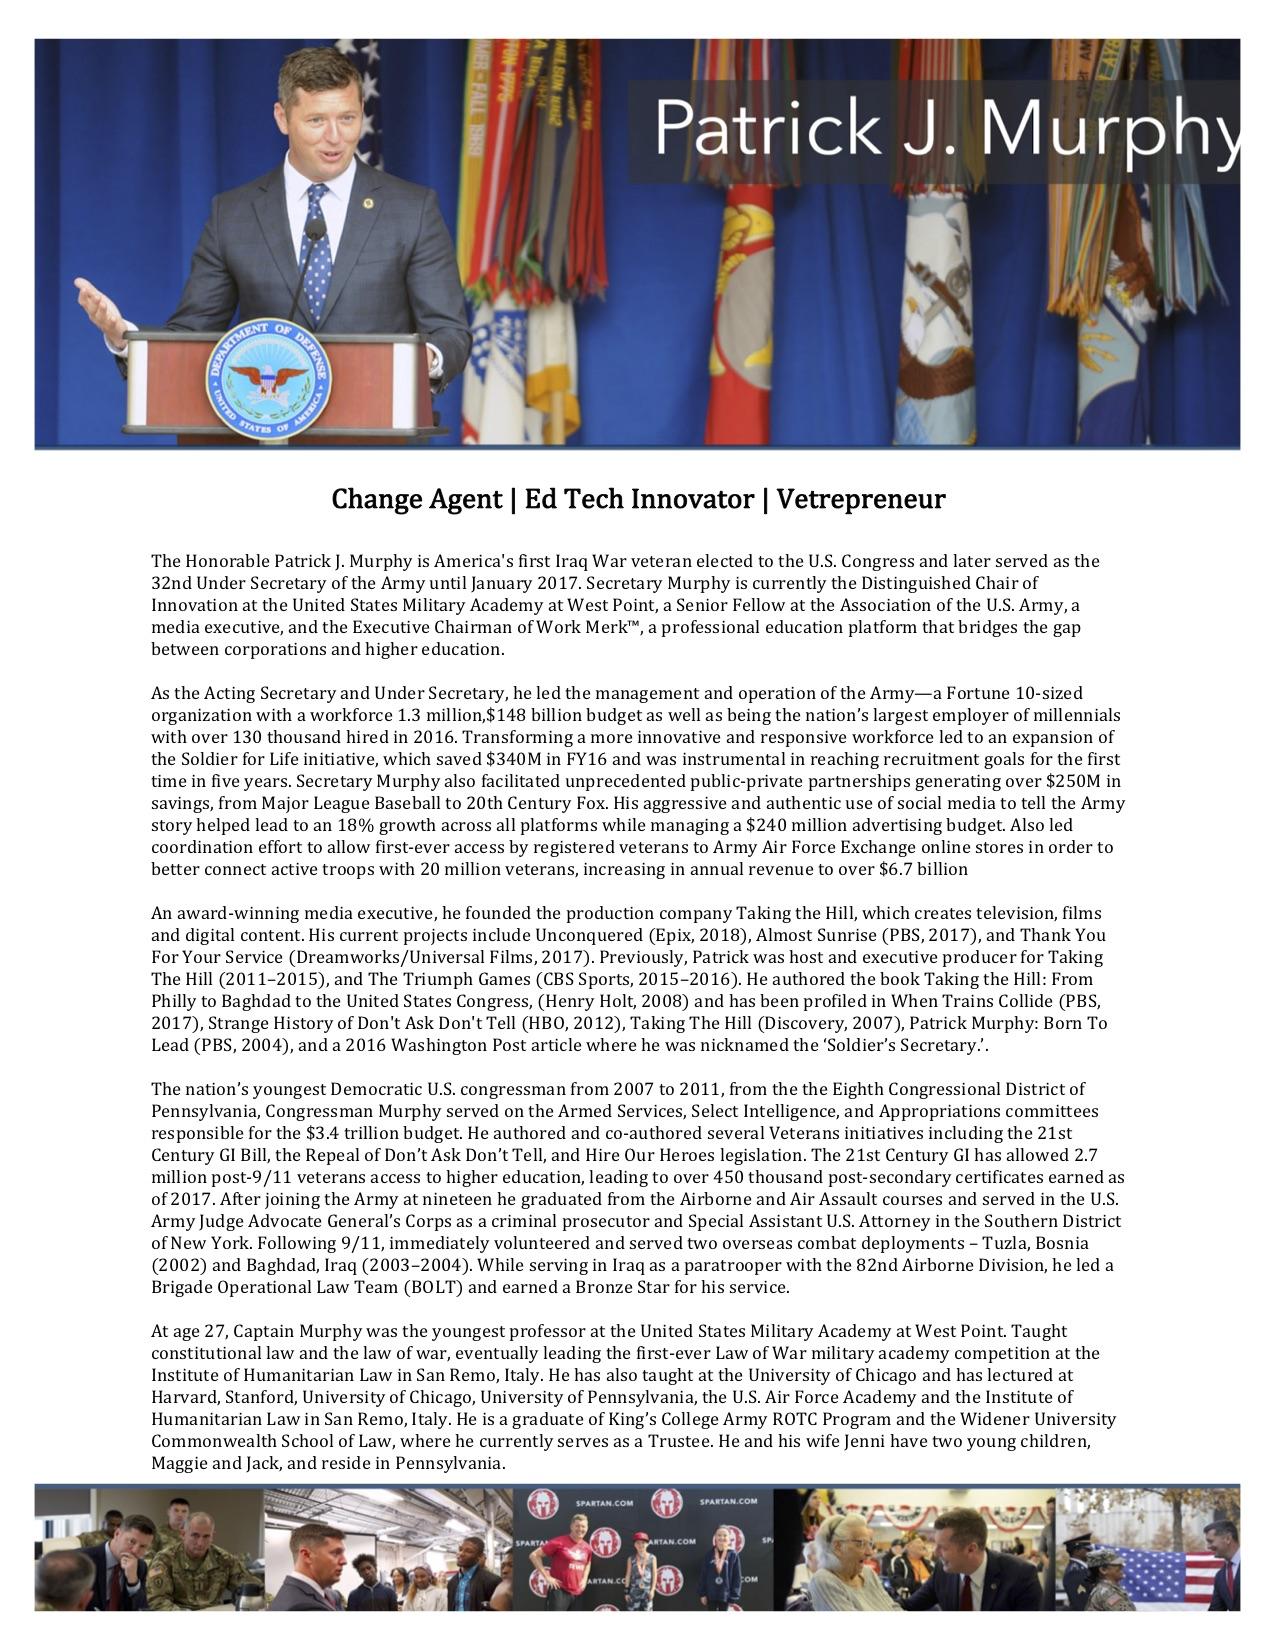 Secretary Patrick J Murphy Bio .jpg